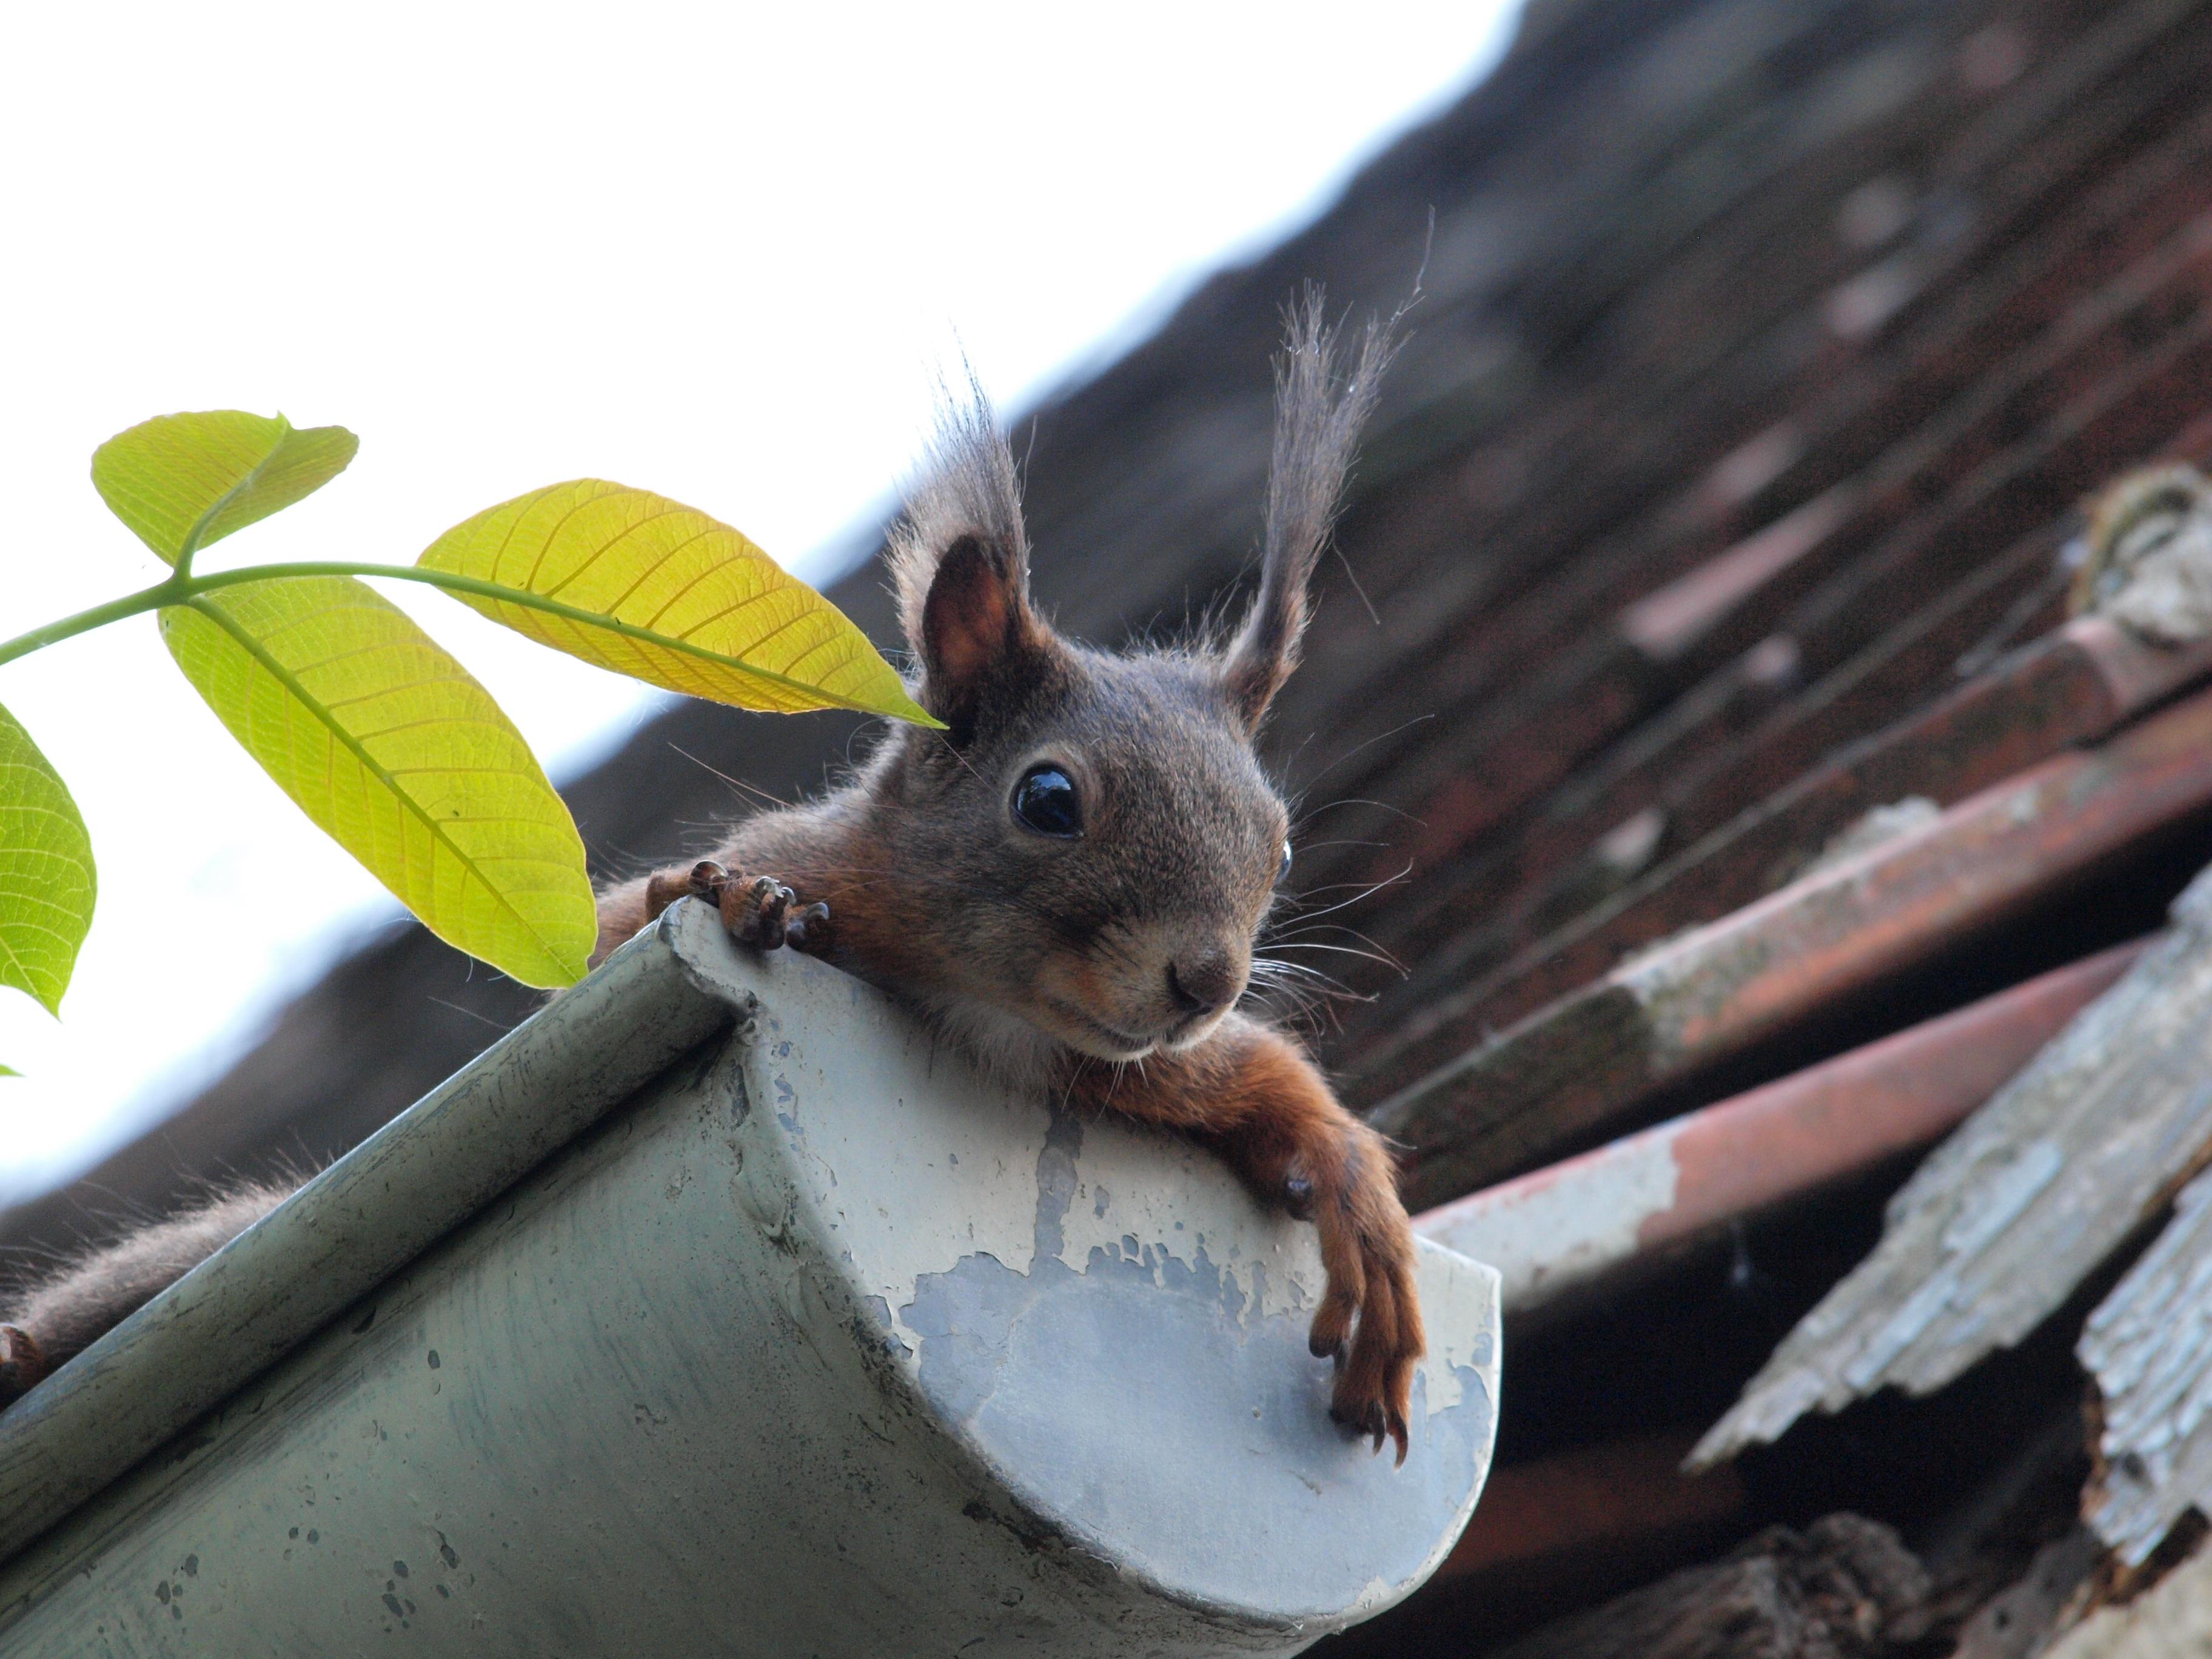 squirrel-curious-gutter-rodent-451009